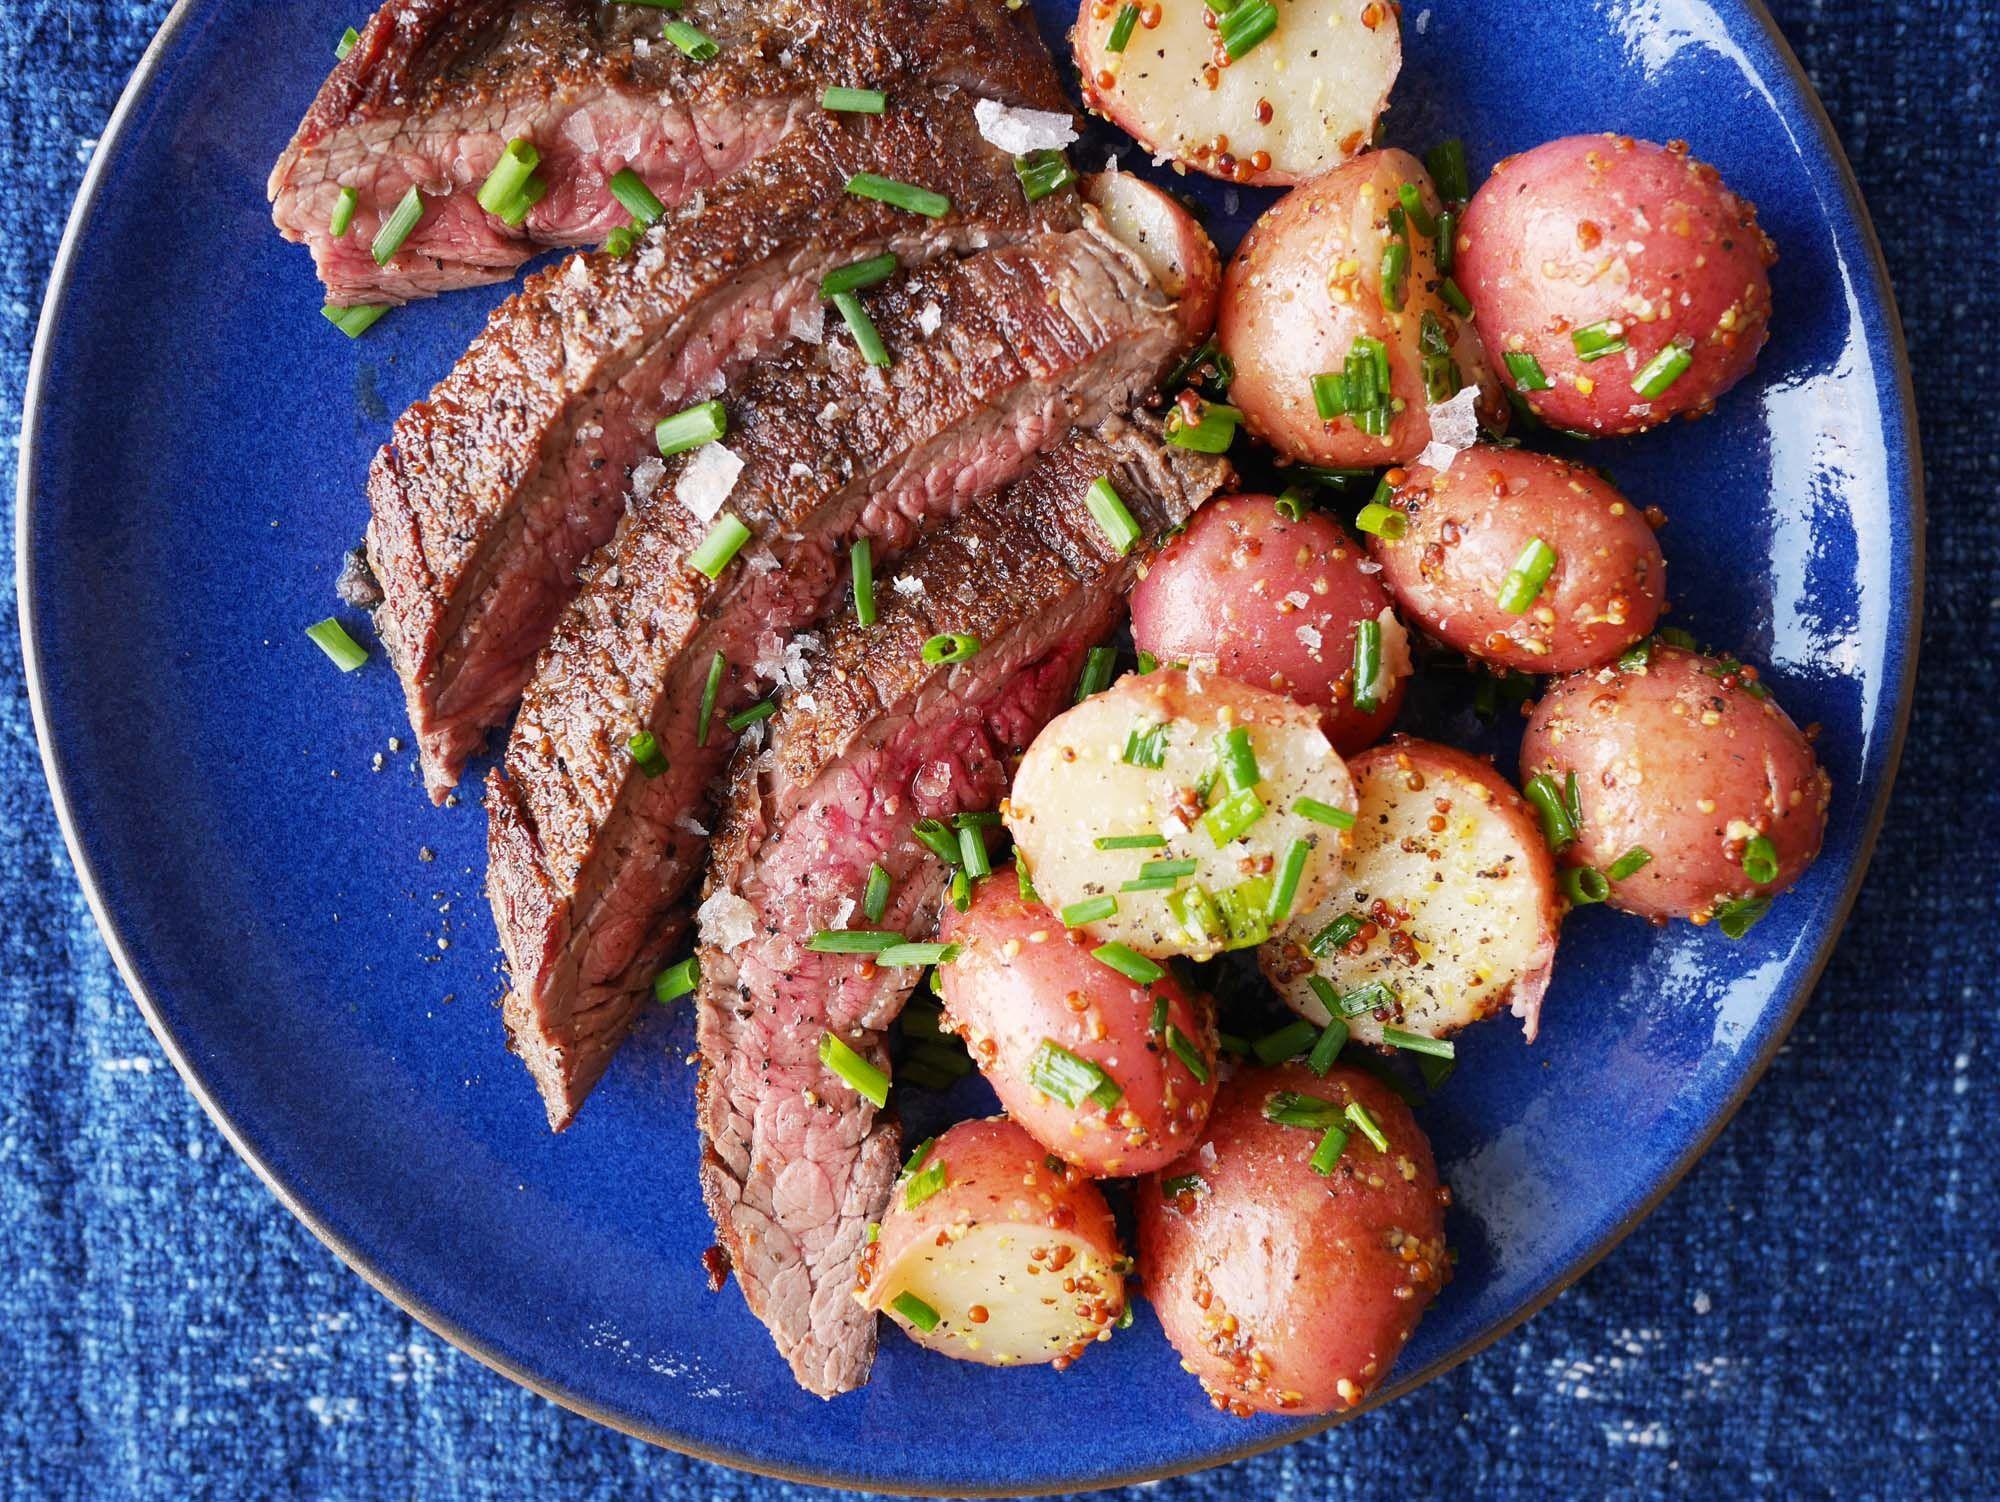 BBQ Skirt Steak with Warm Potato Salad picture